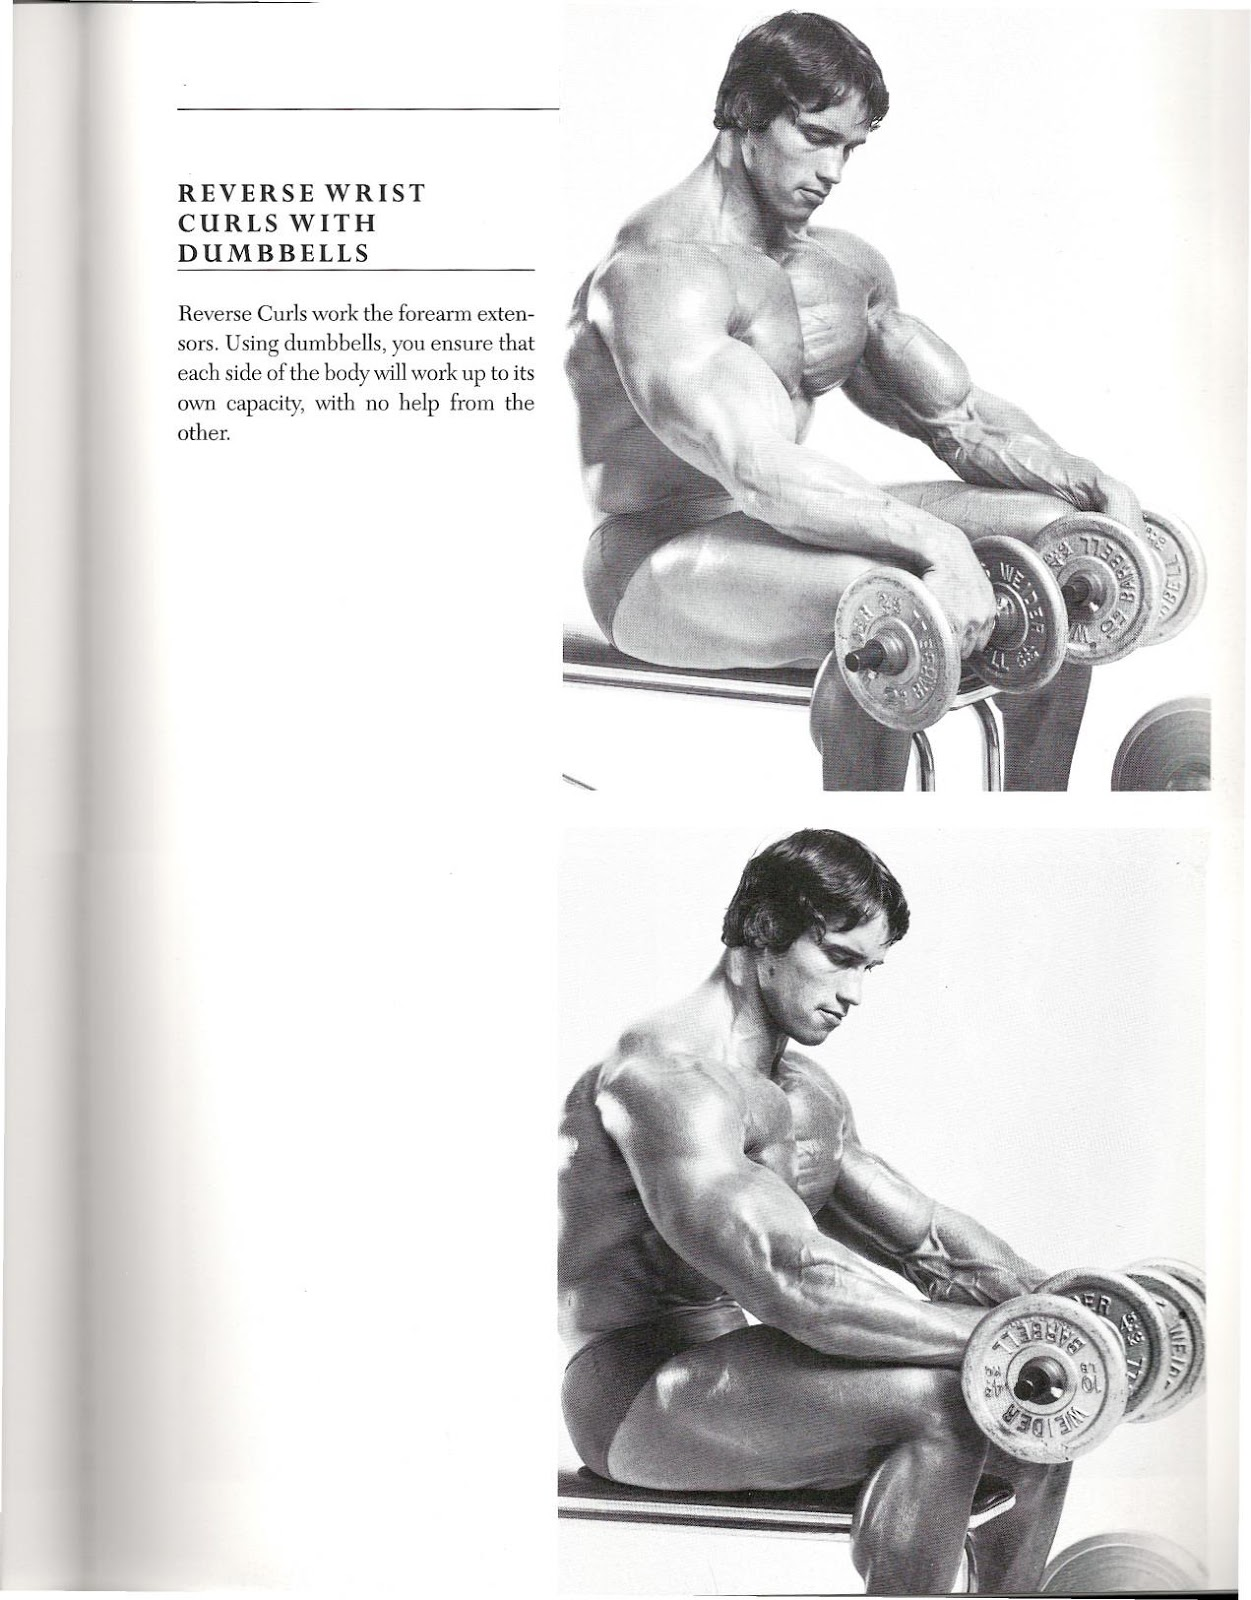 Arnold schwarzenegger bodybuilding book pdf tips for life 005g malvernweather Images